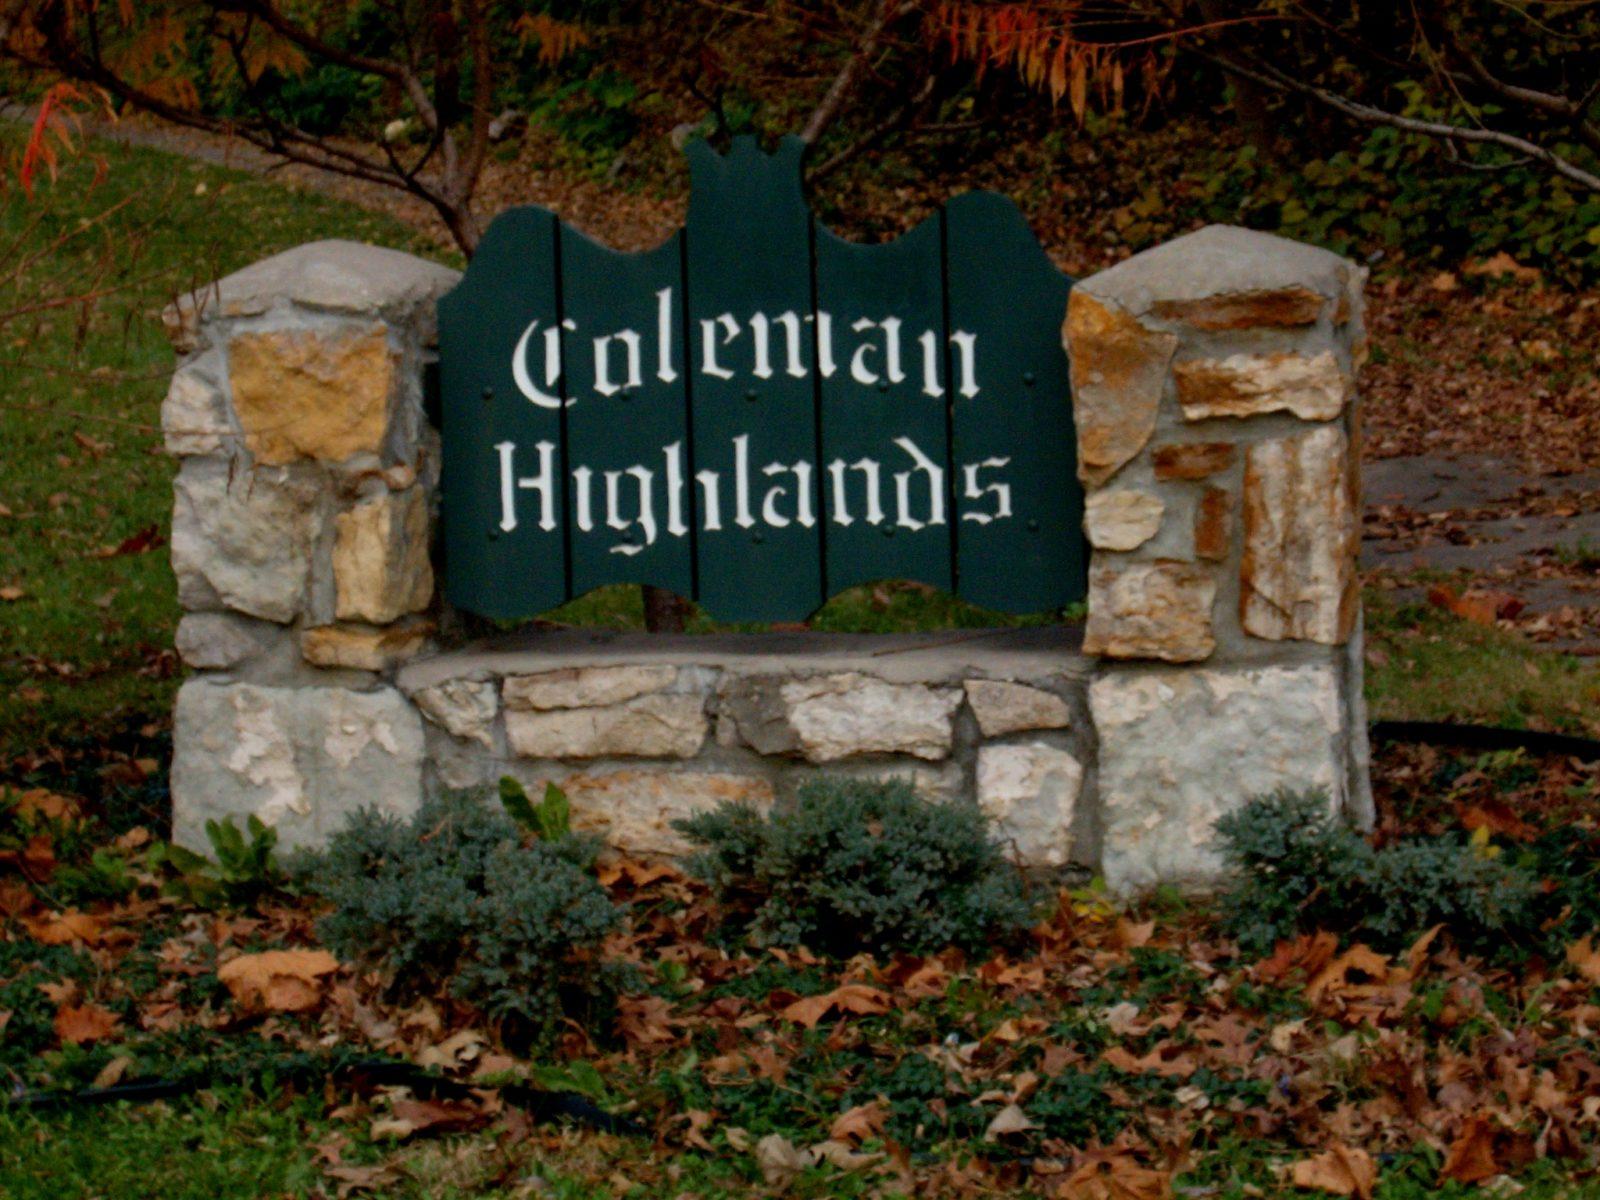 Coleman Highlands: A Historic District